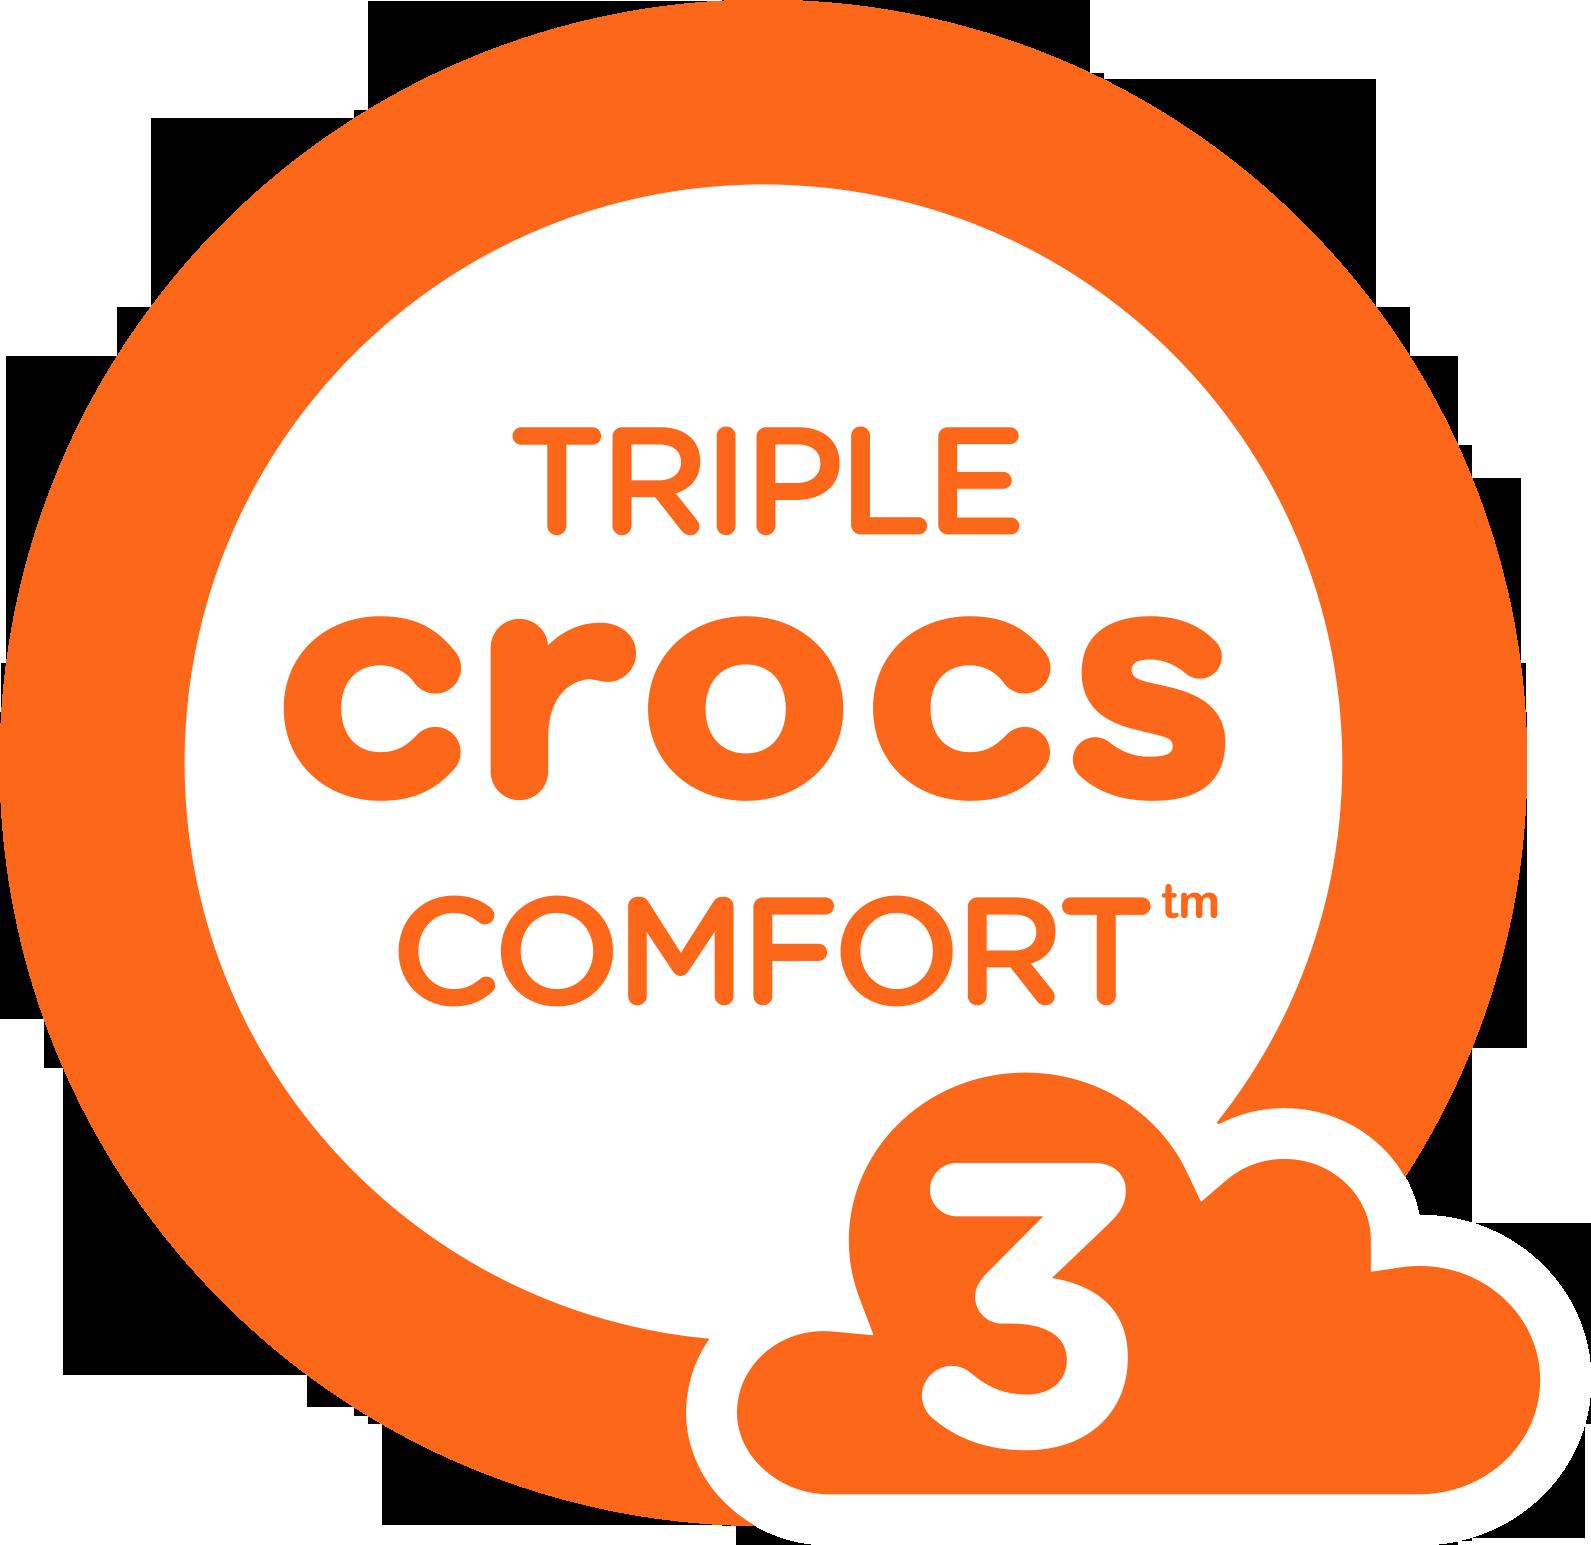 Triple Crocs Comfort